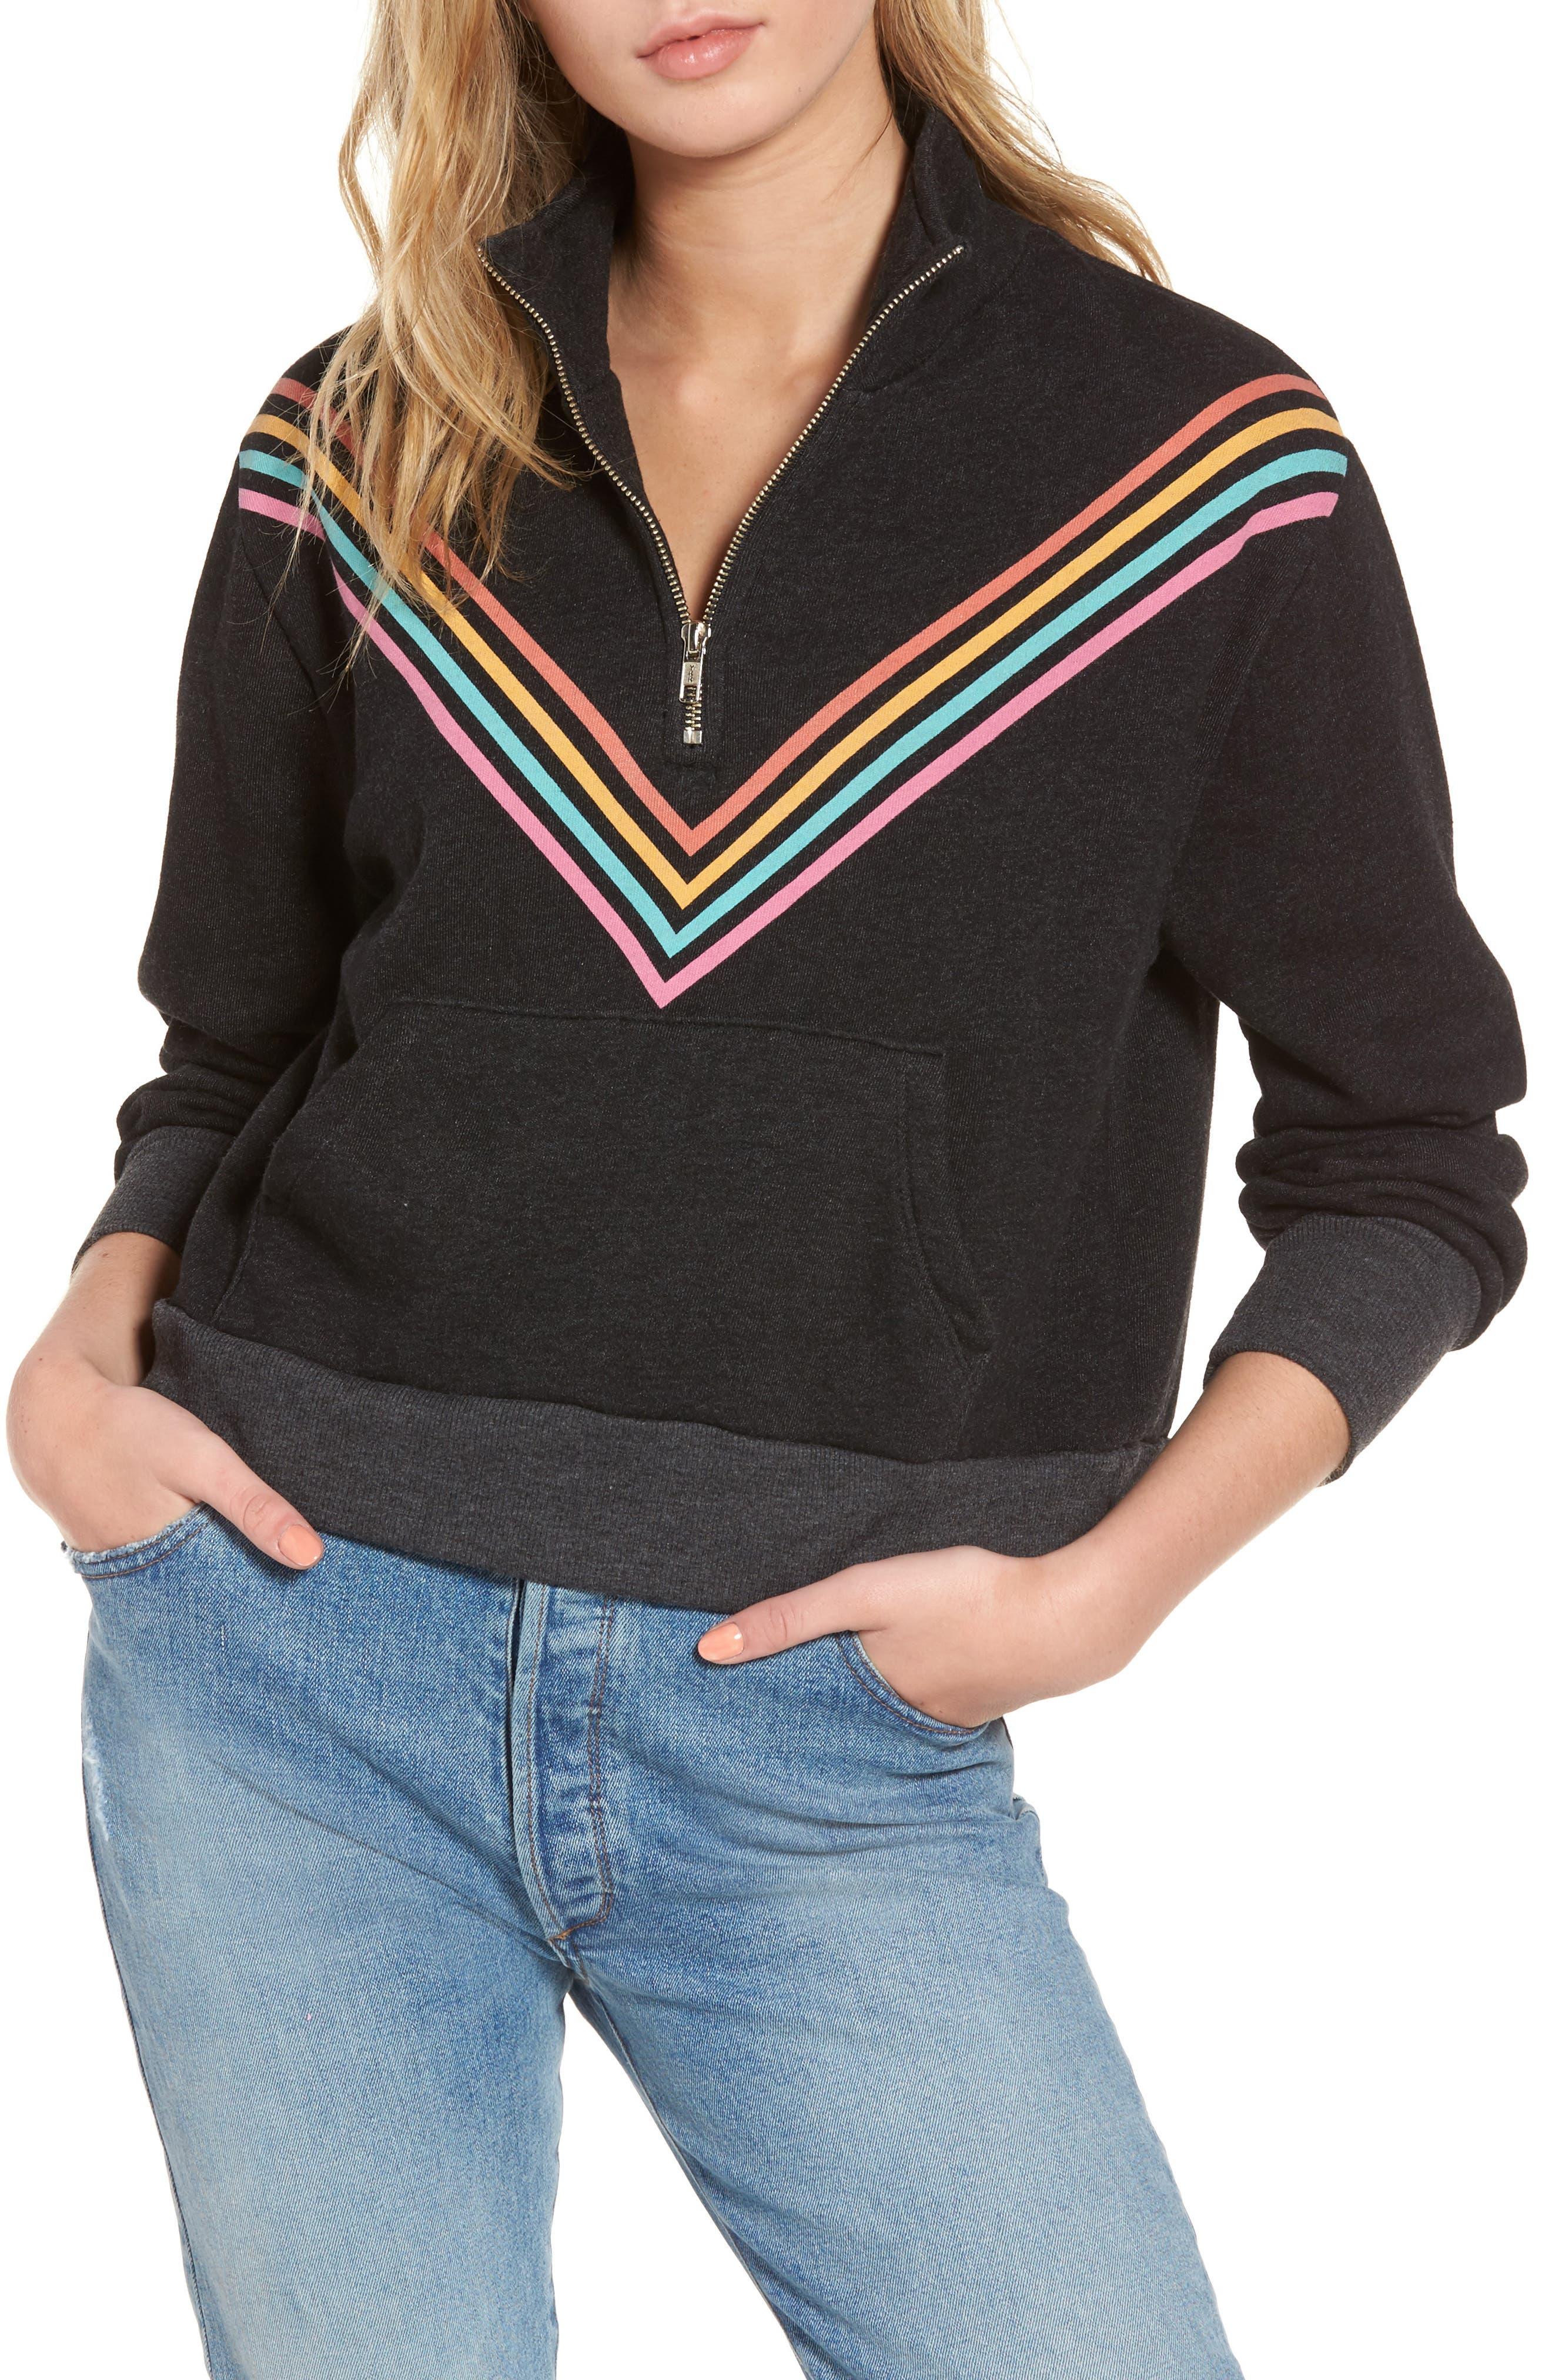 '80s Track Star Soto Warm-Up Sweatshirt,                         Main,                         color, Heathered Black